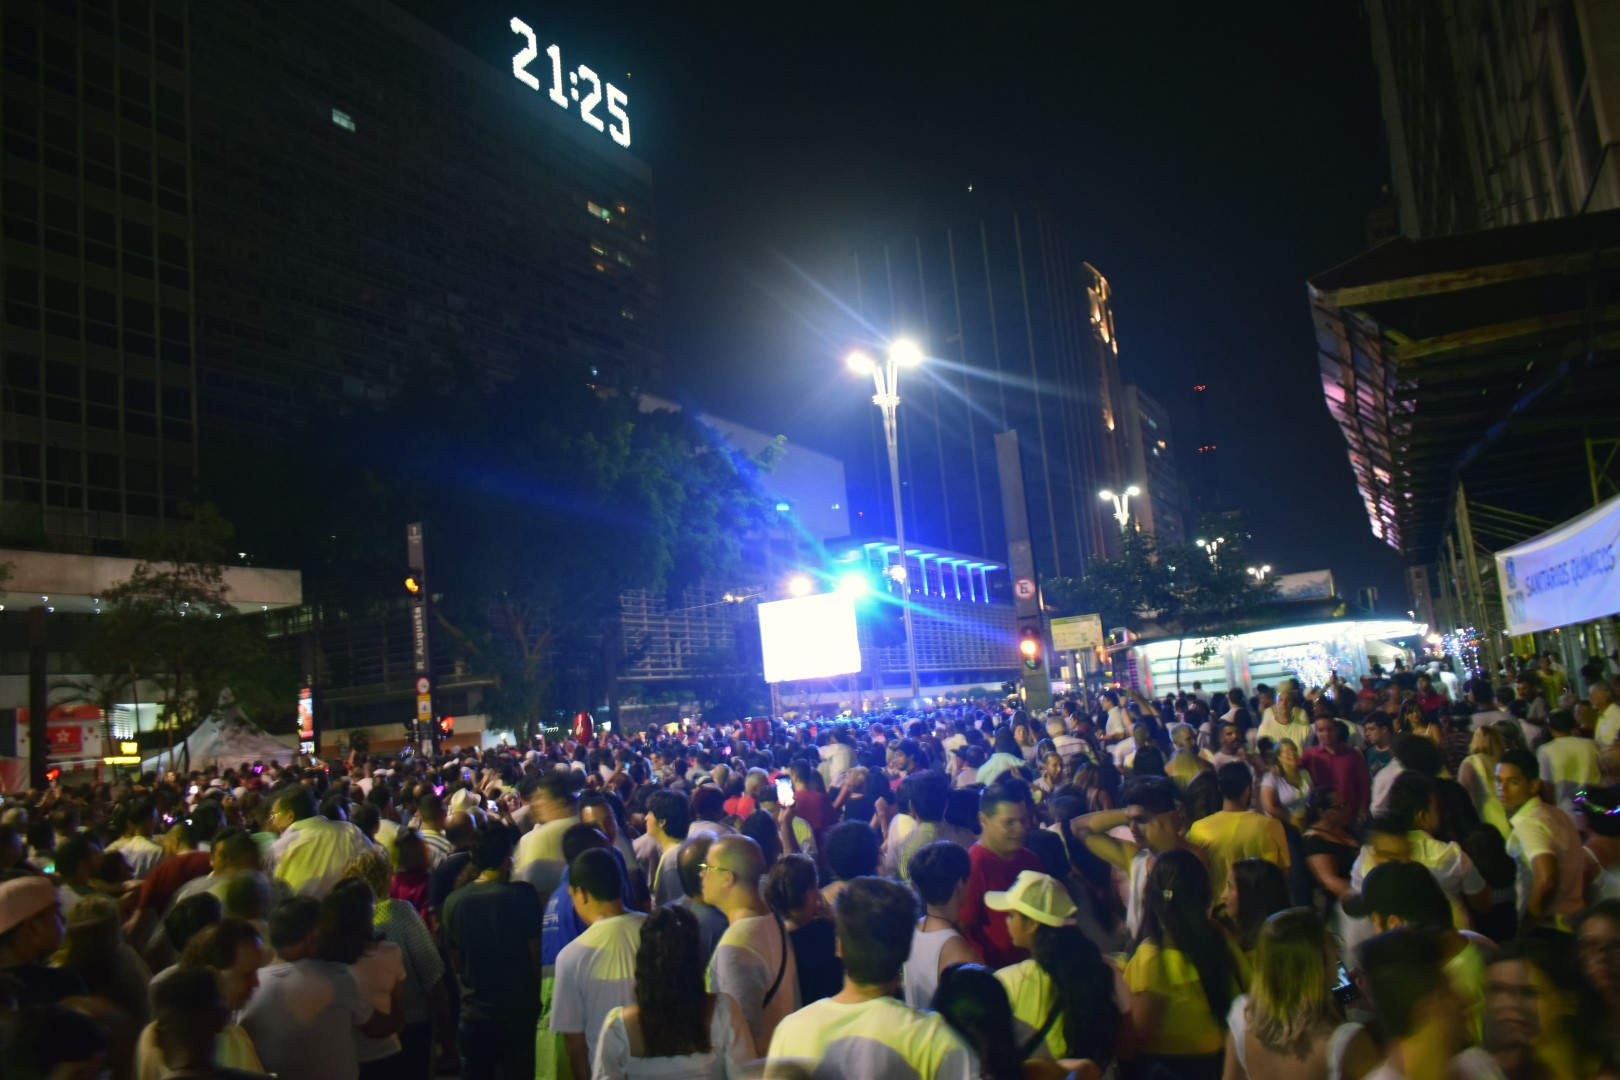 Réveillon 2020 in São Paulo, Avenida Paulista